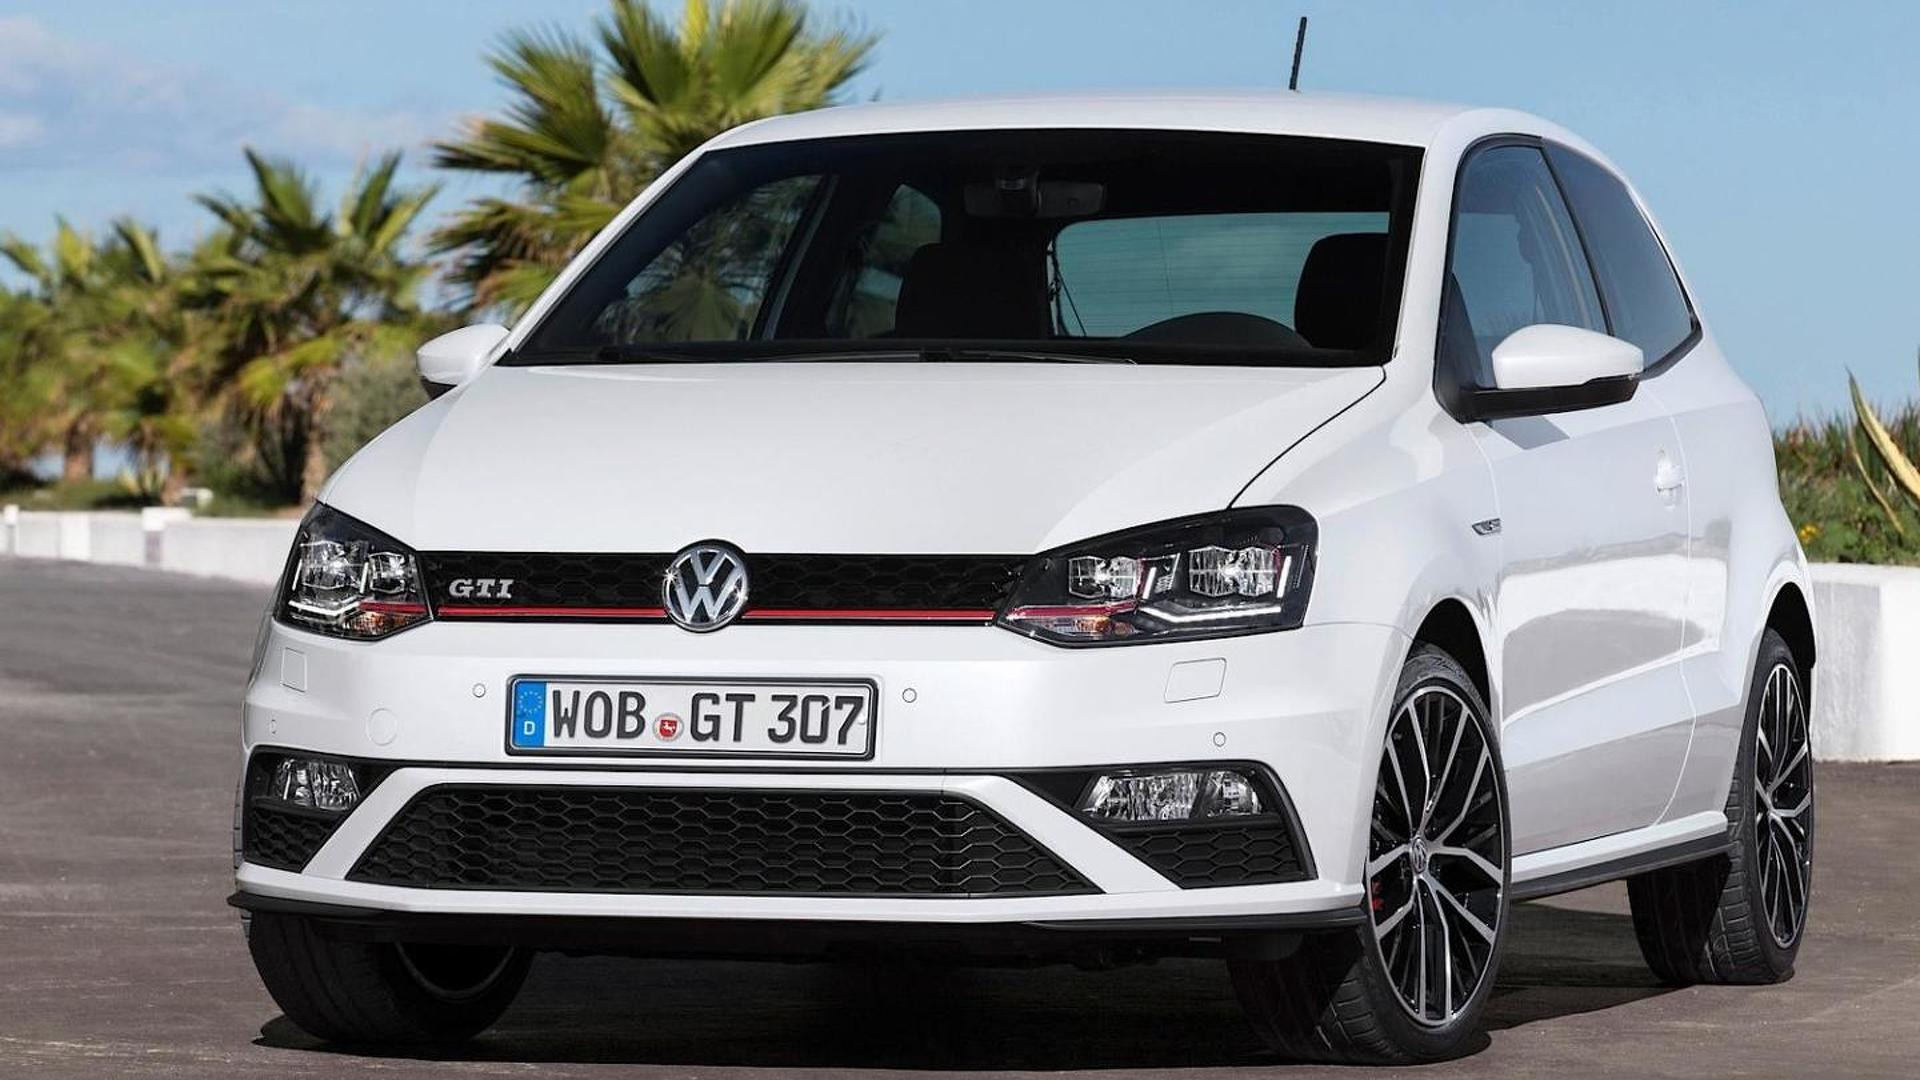 Обновленный Volkswagen Polo GTI 2014